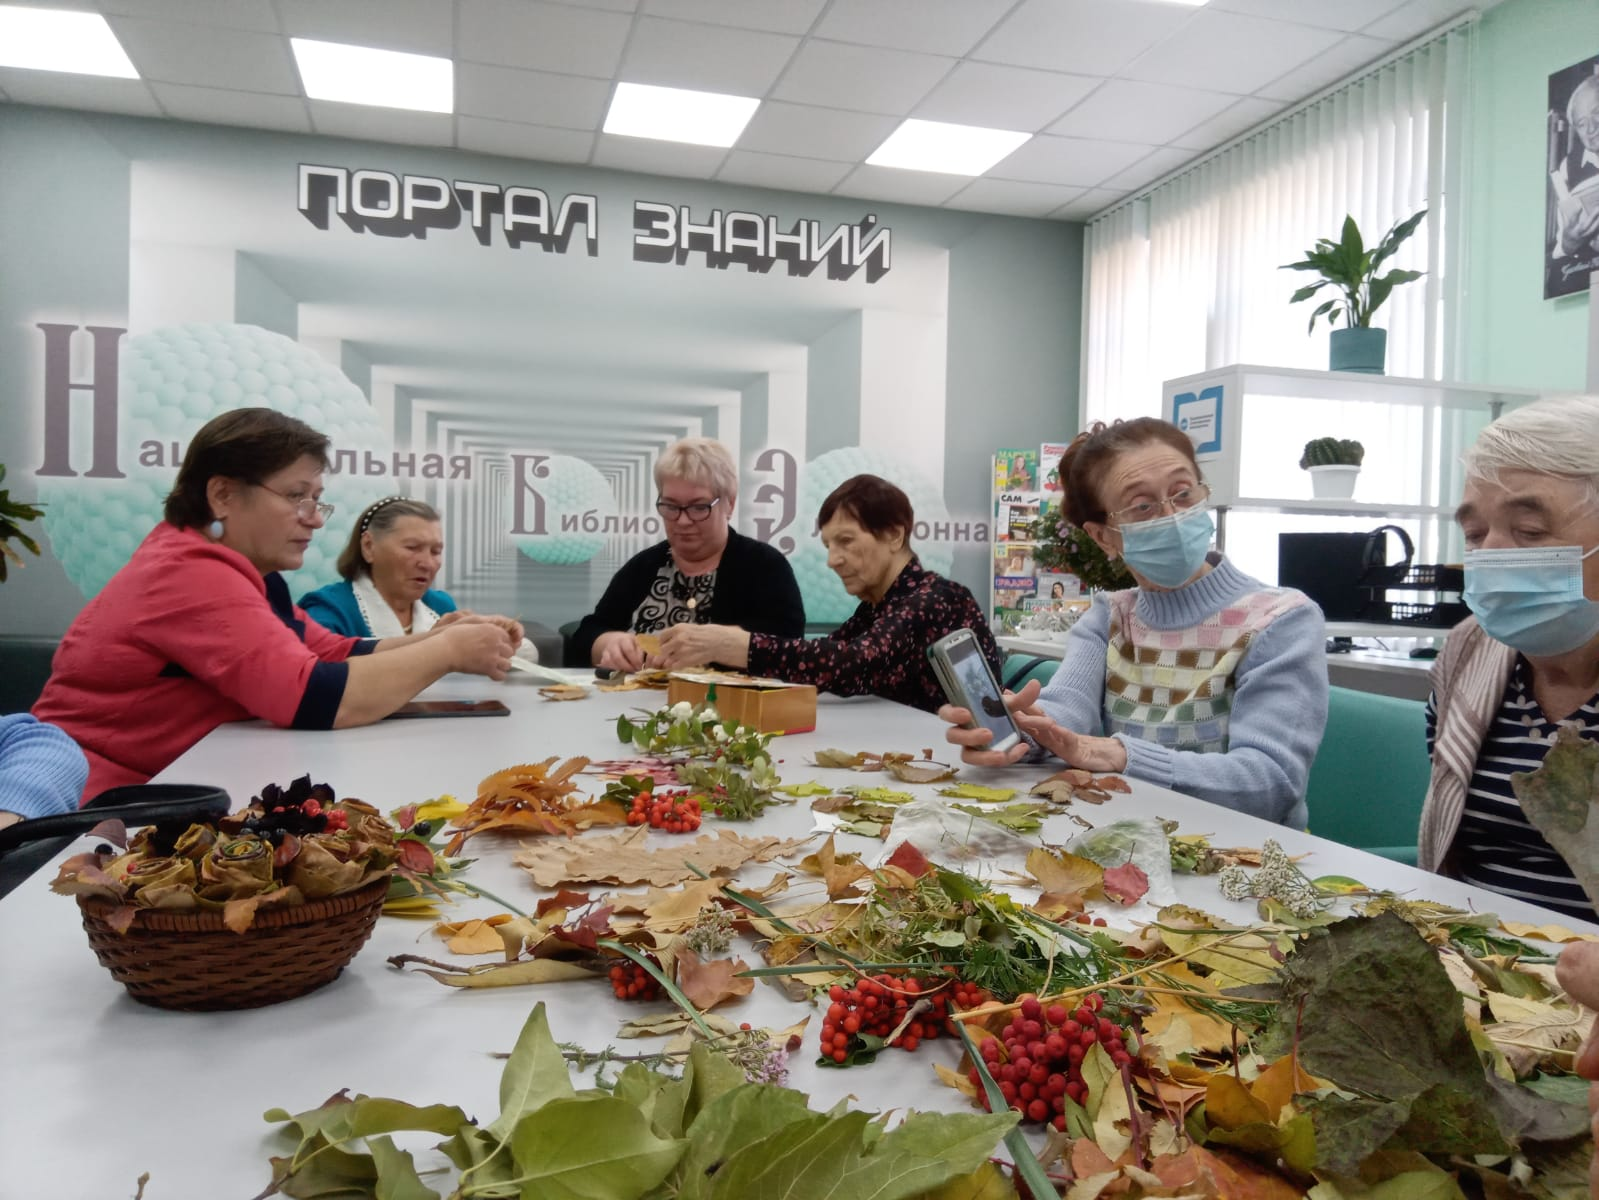 Read more about the article Путевка выходного дня «И, незаметно листьями шурша, приходит Осень…»